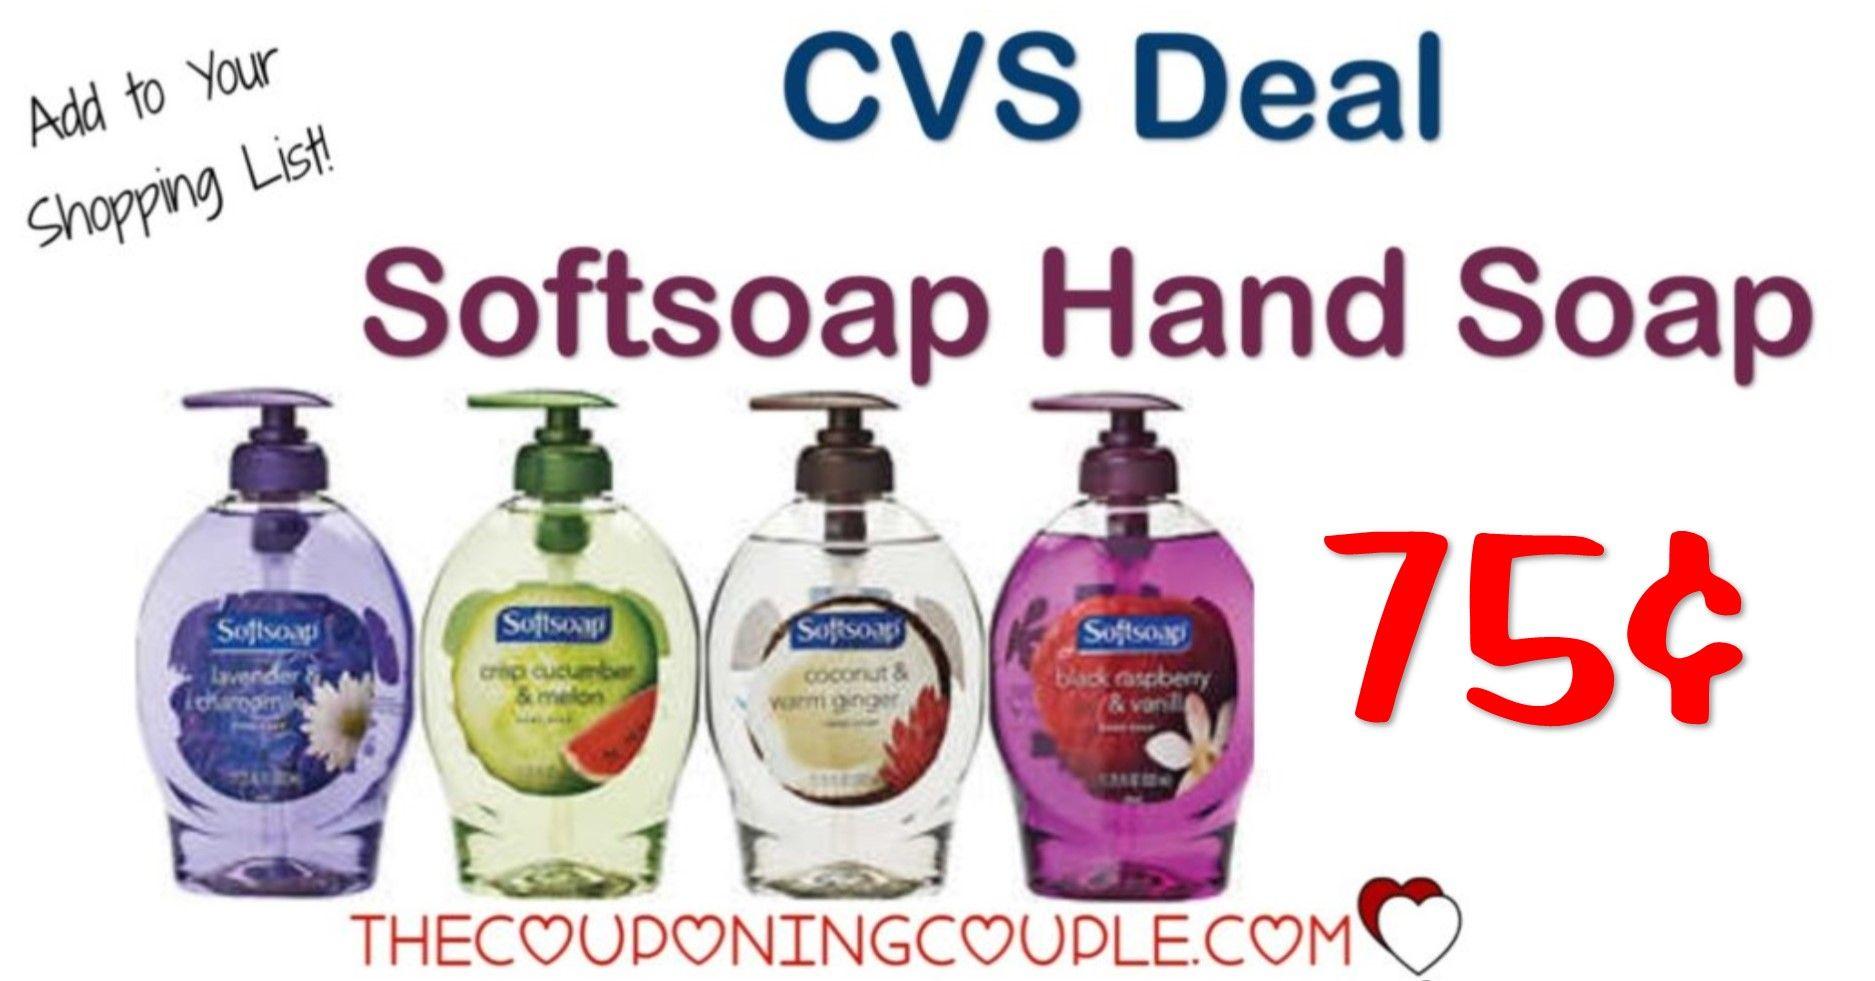 Softsoap Hand Soap Pump 0 75 Cvs In 2020 Softsoap Hand Soap Pump Soap